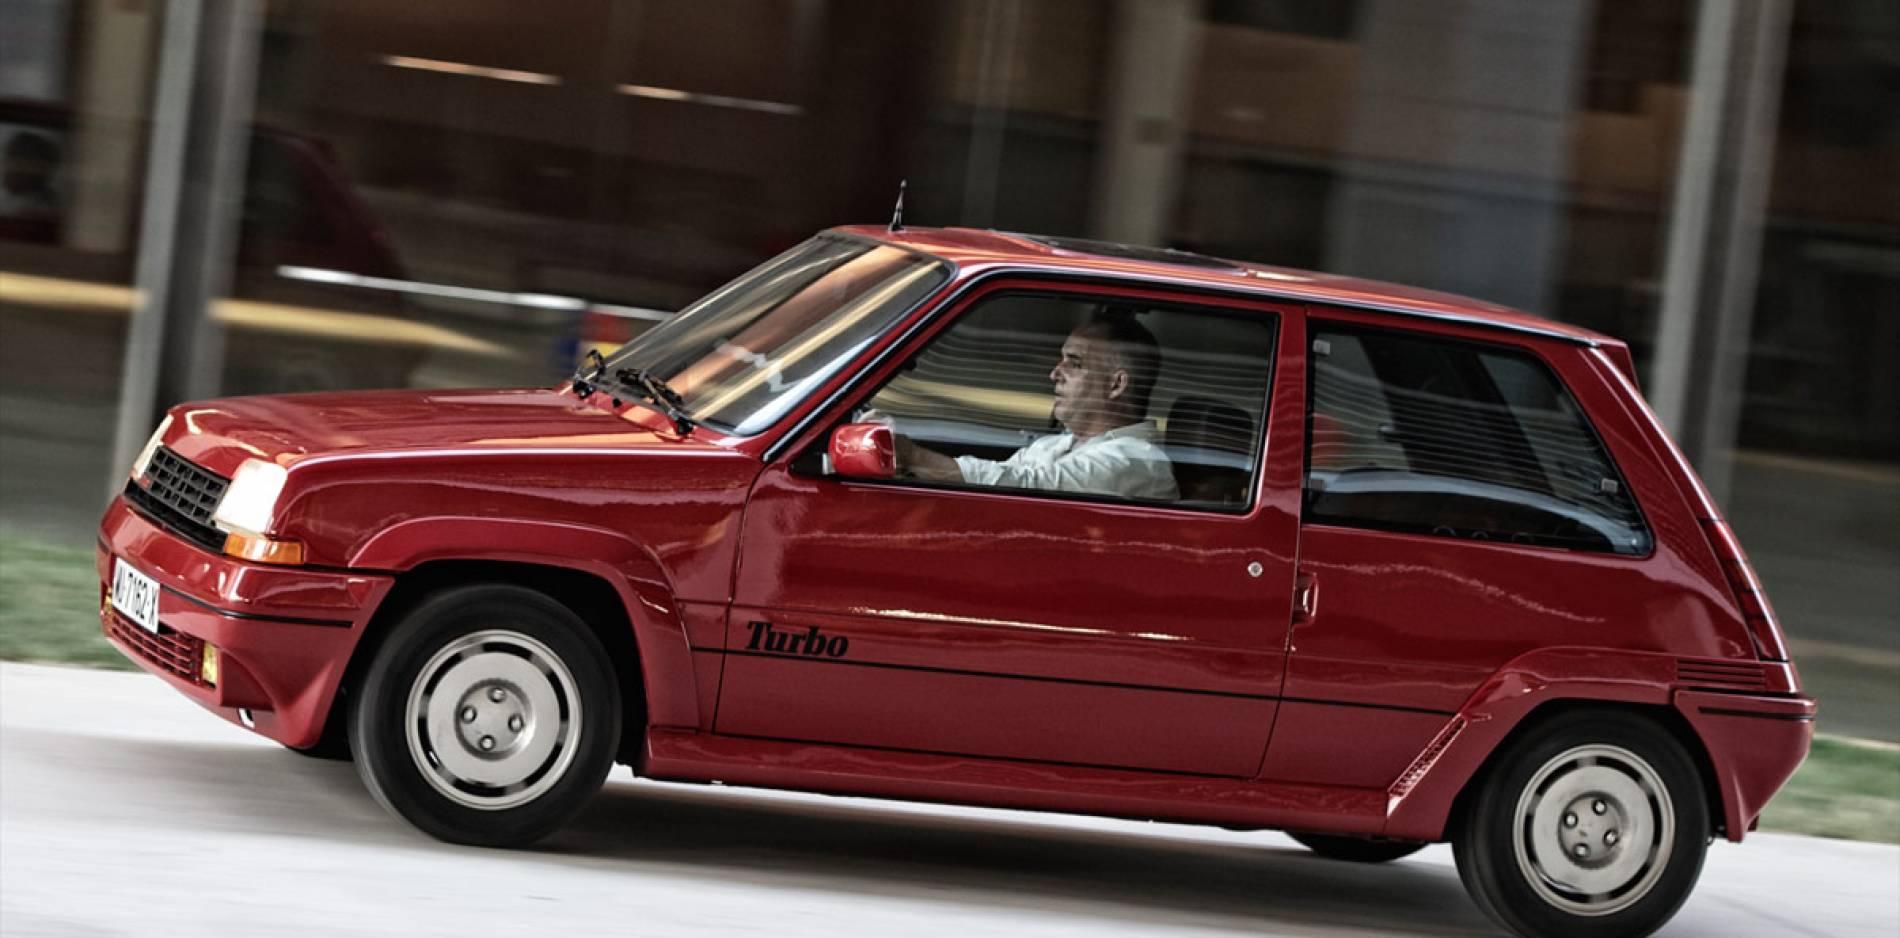 Prueba: Renault Supercinco GT Turbo